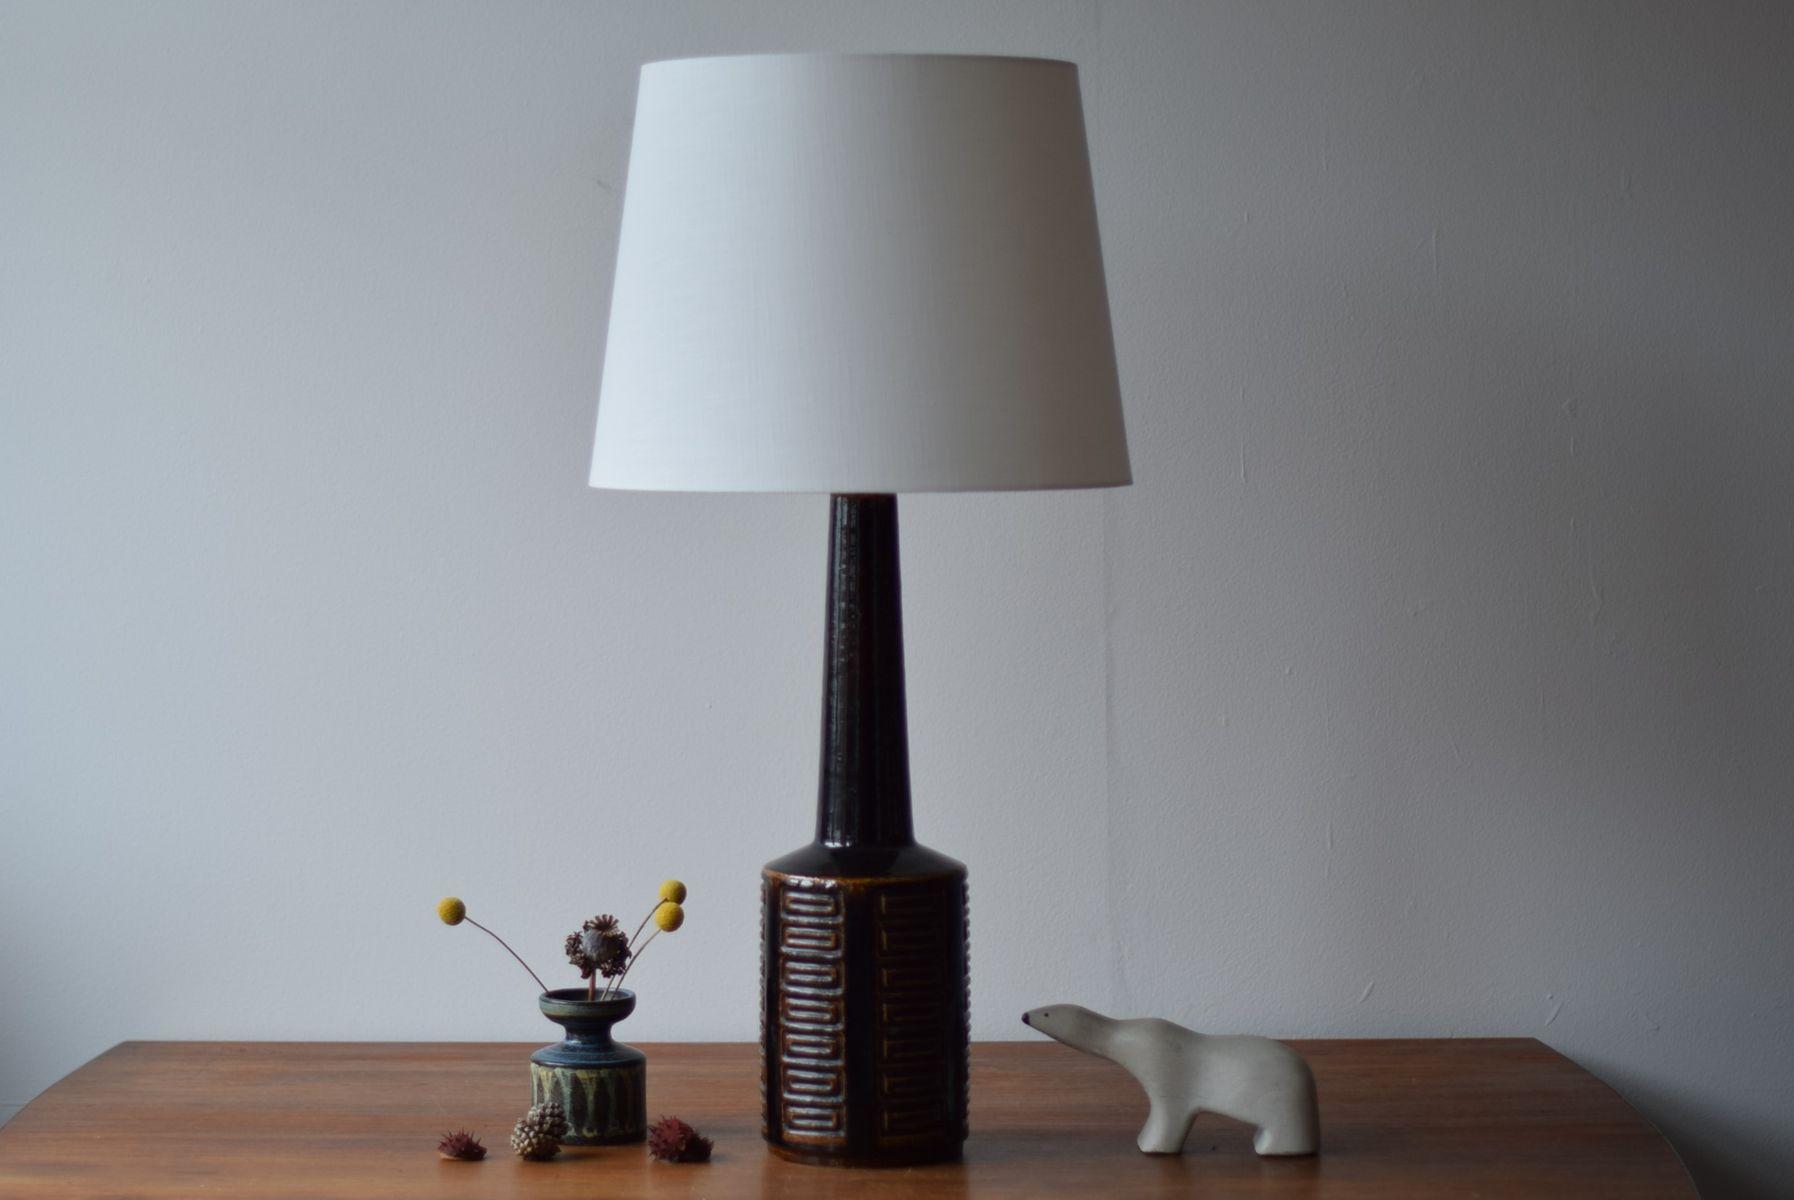 Very Tall Scandinavian Brown Table Lamp By Per Linnemann Schmidt For Palshus 1960s